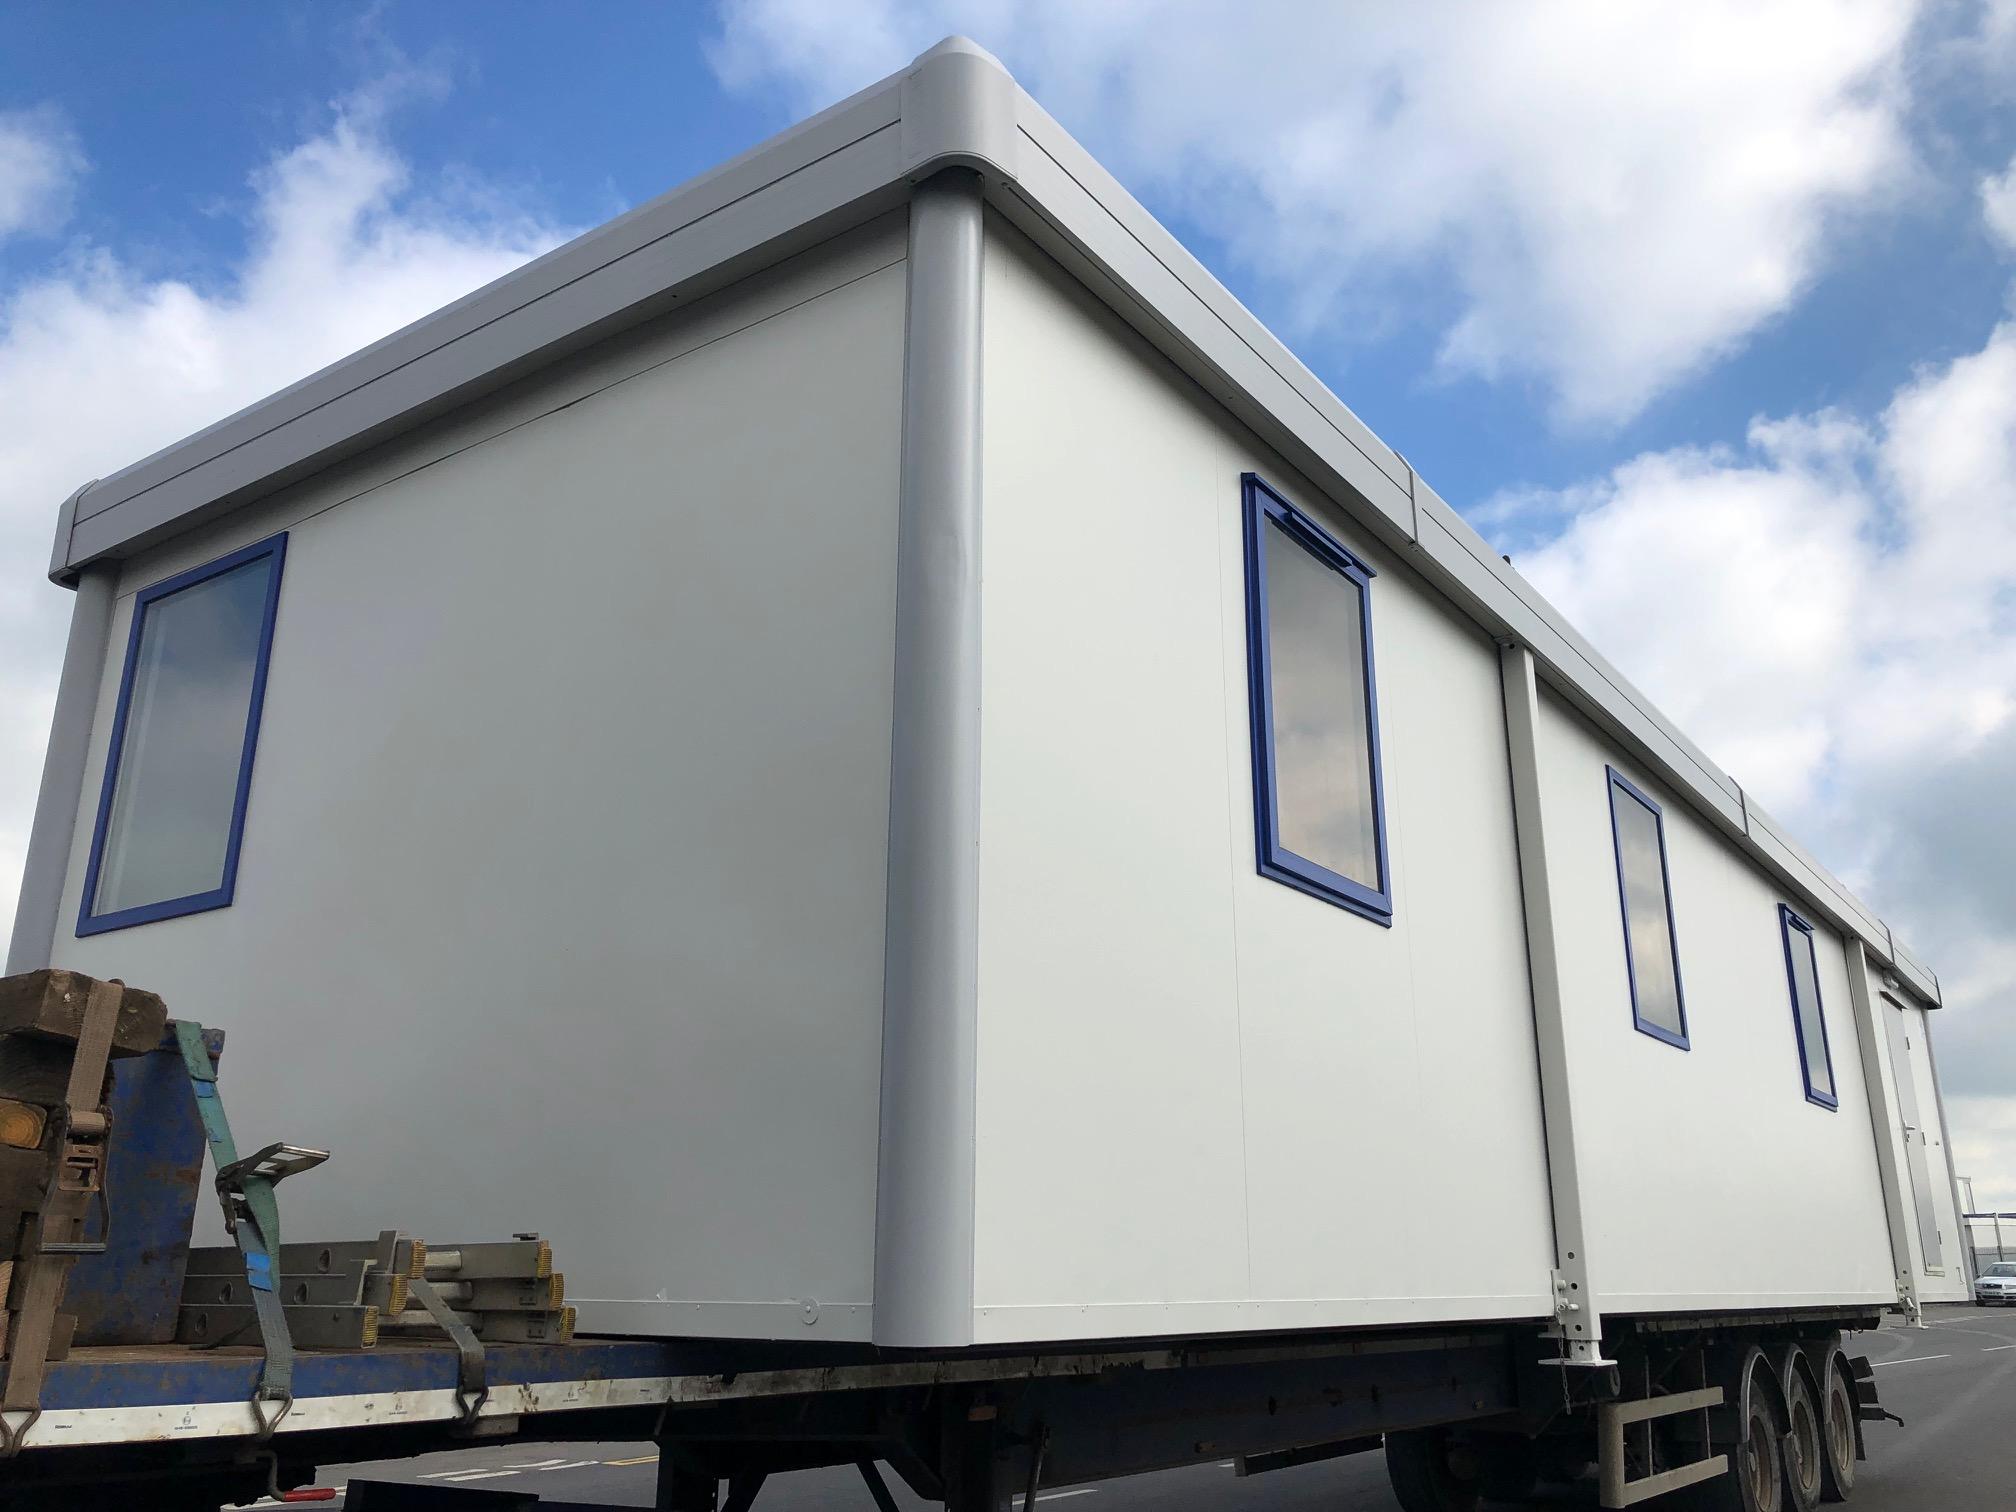 Refurbished Portable Building